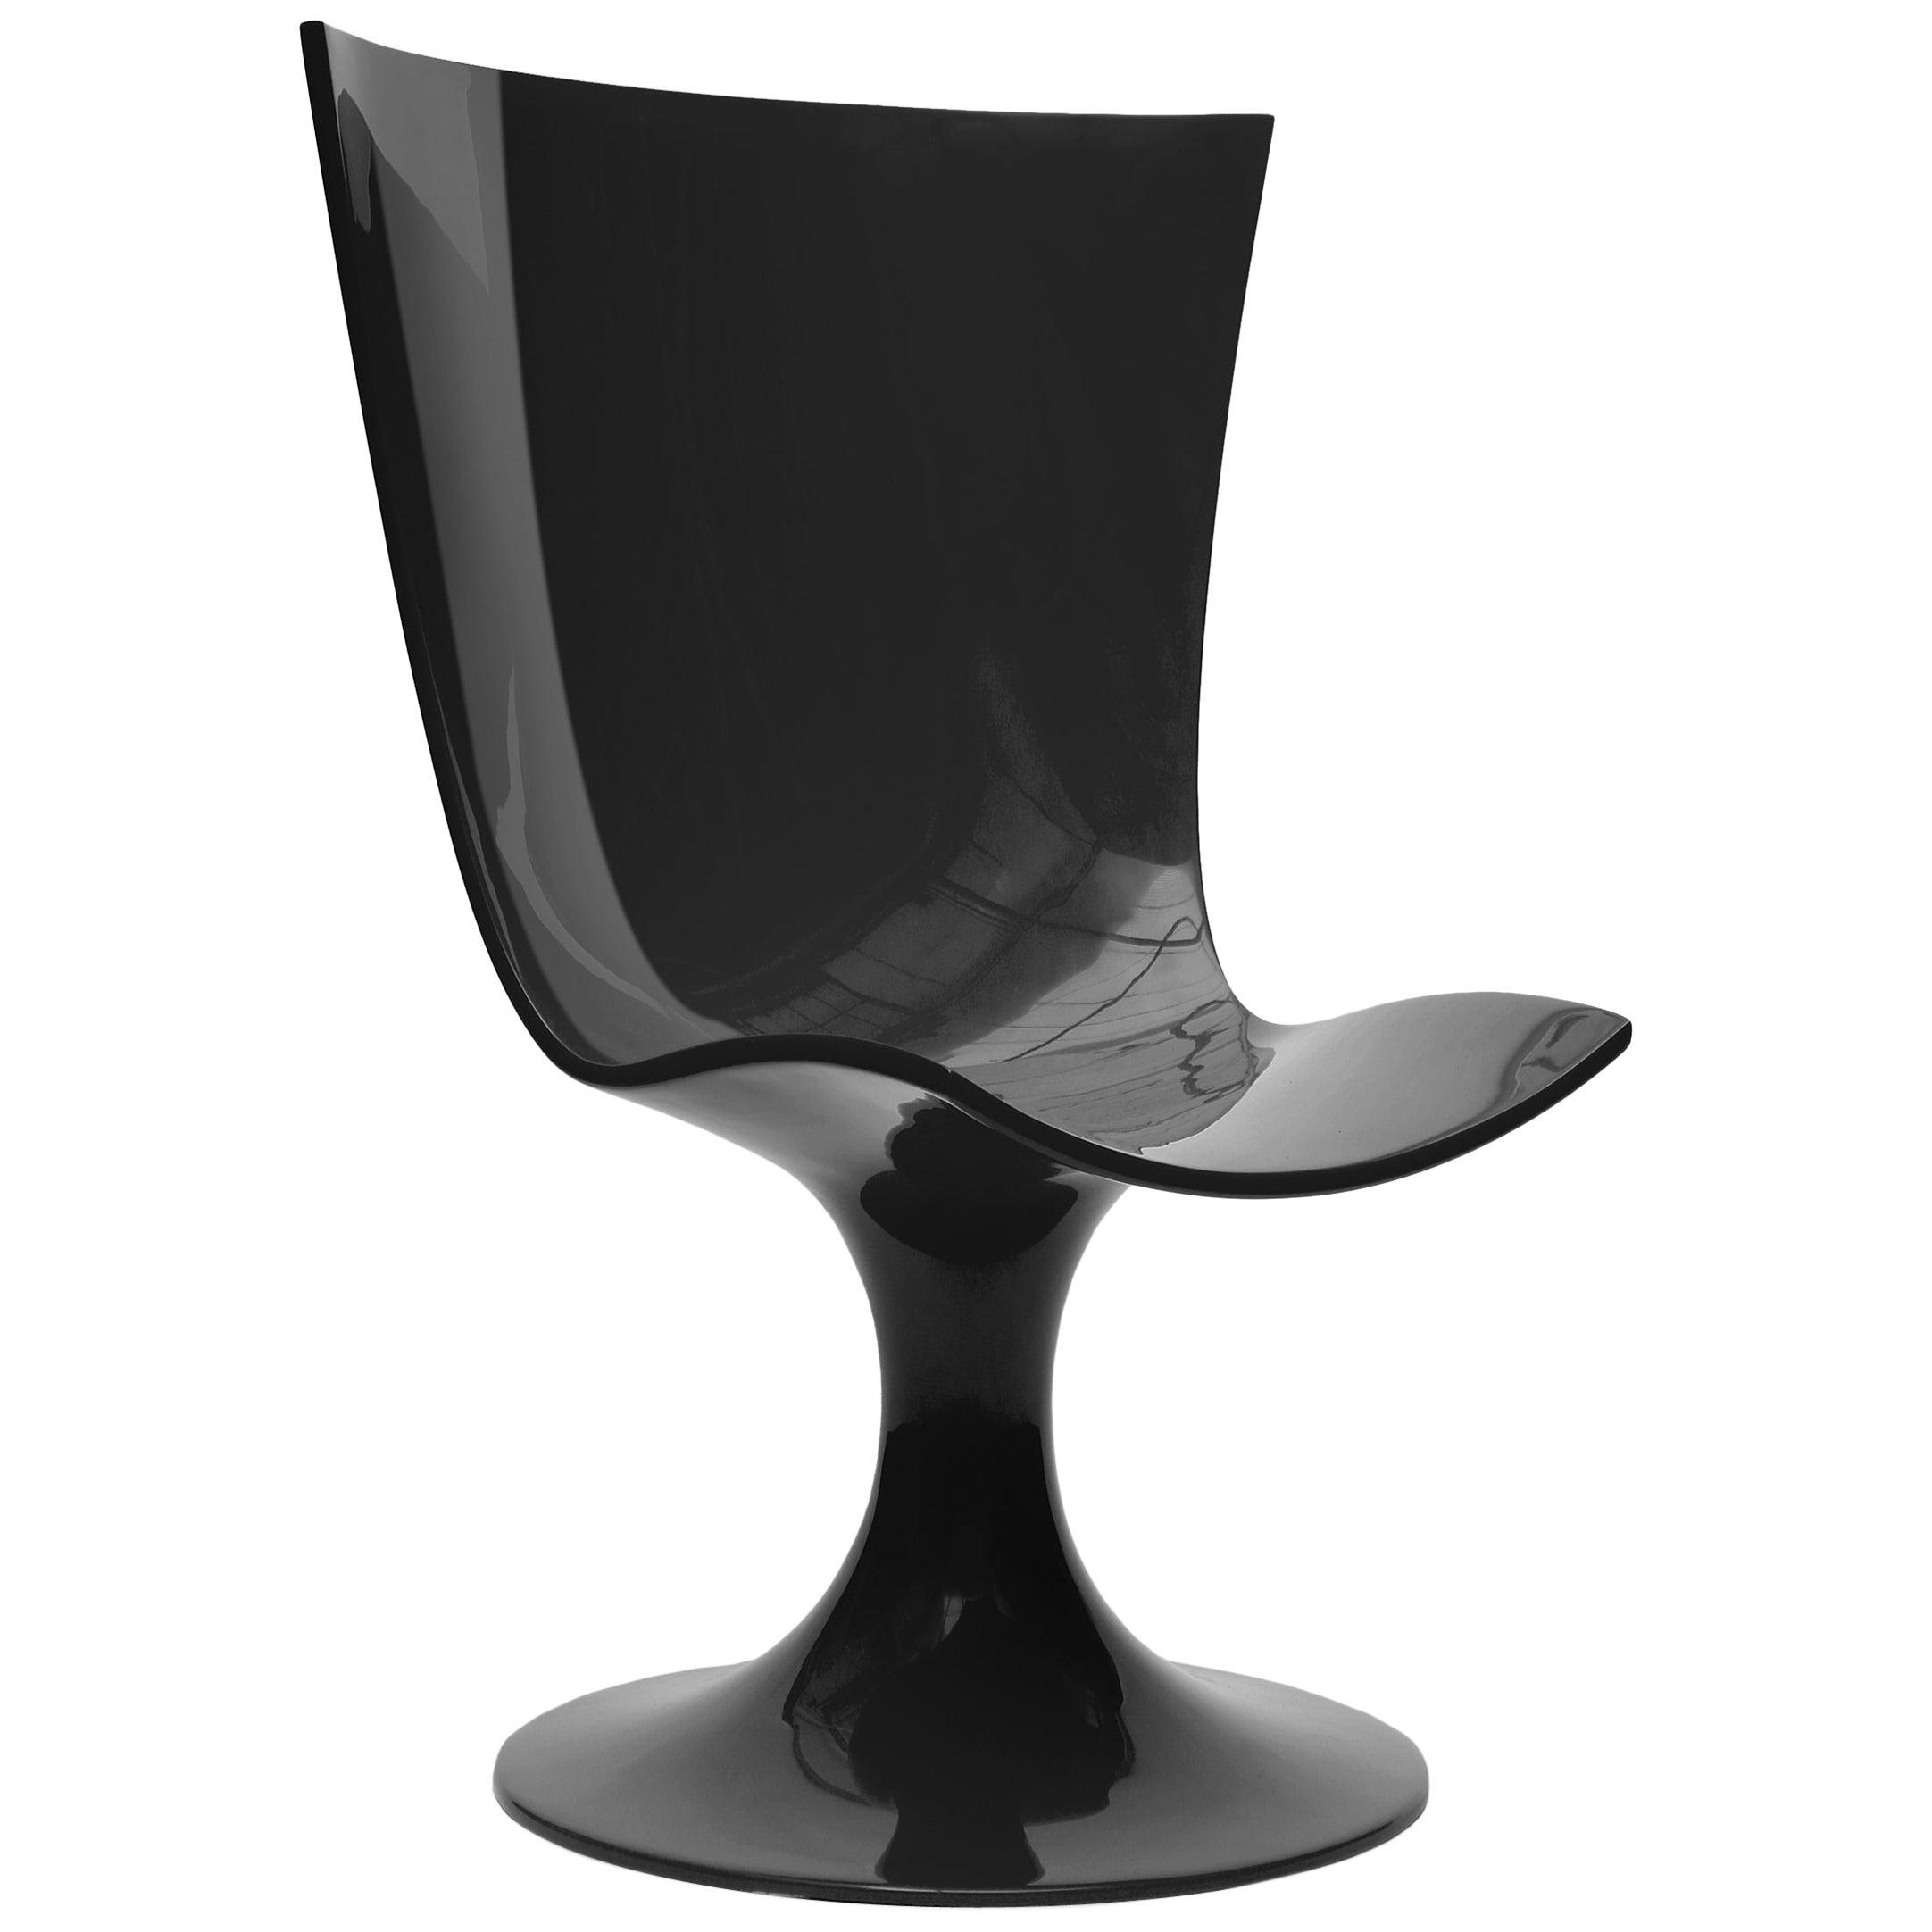 Imposing Black Seat, Decorative and Sculptural Santos Chair by Joel Escalona